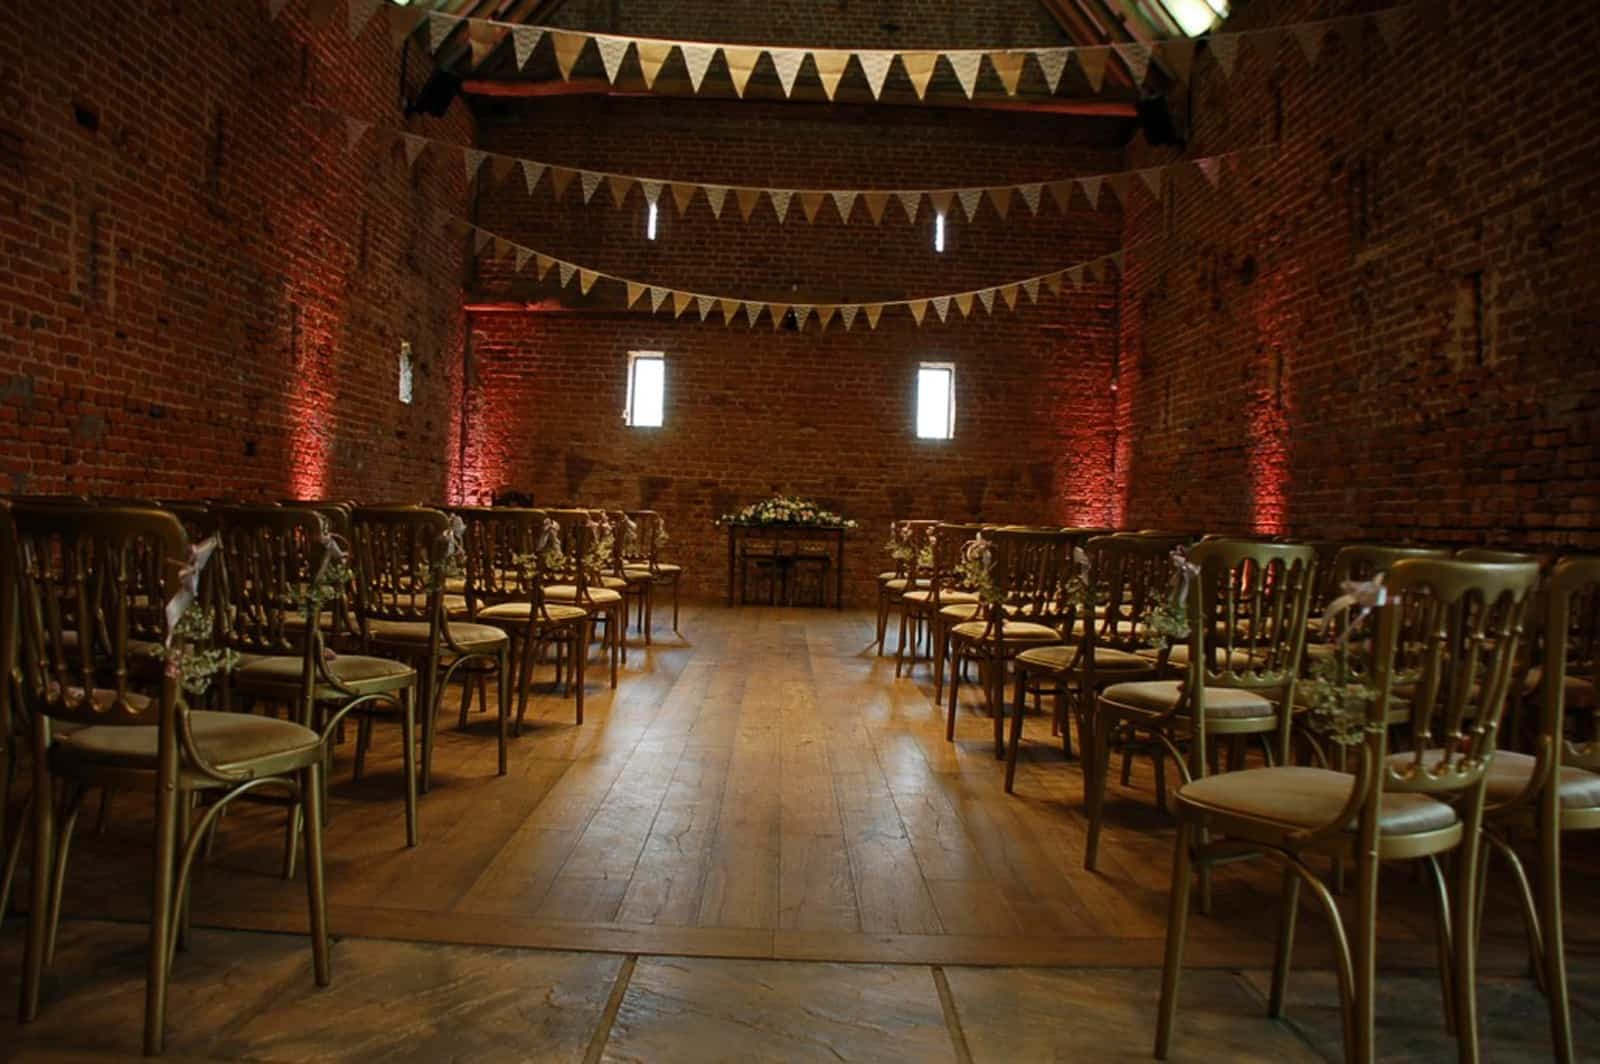 Floral wedding setting